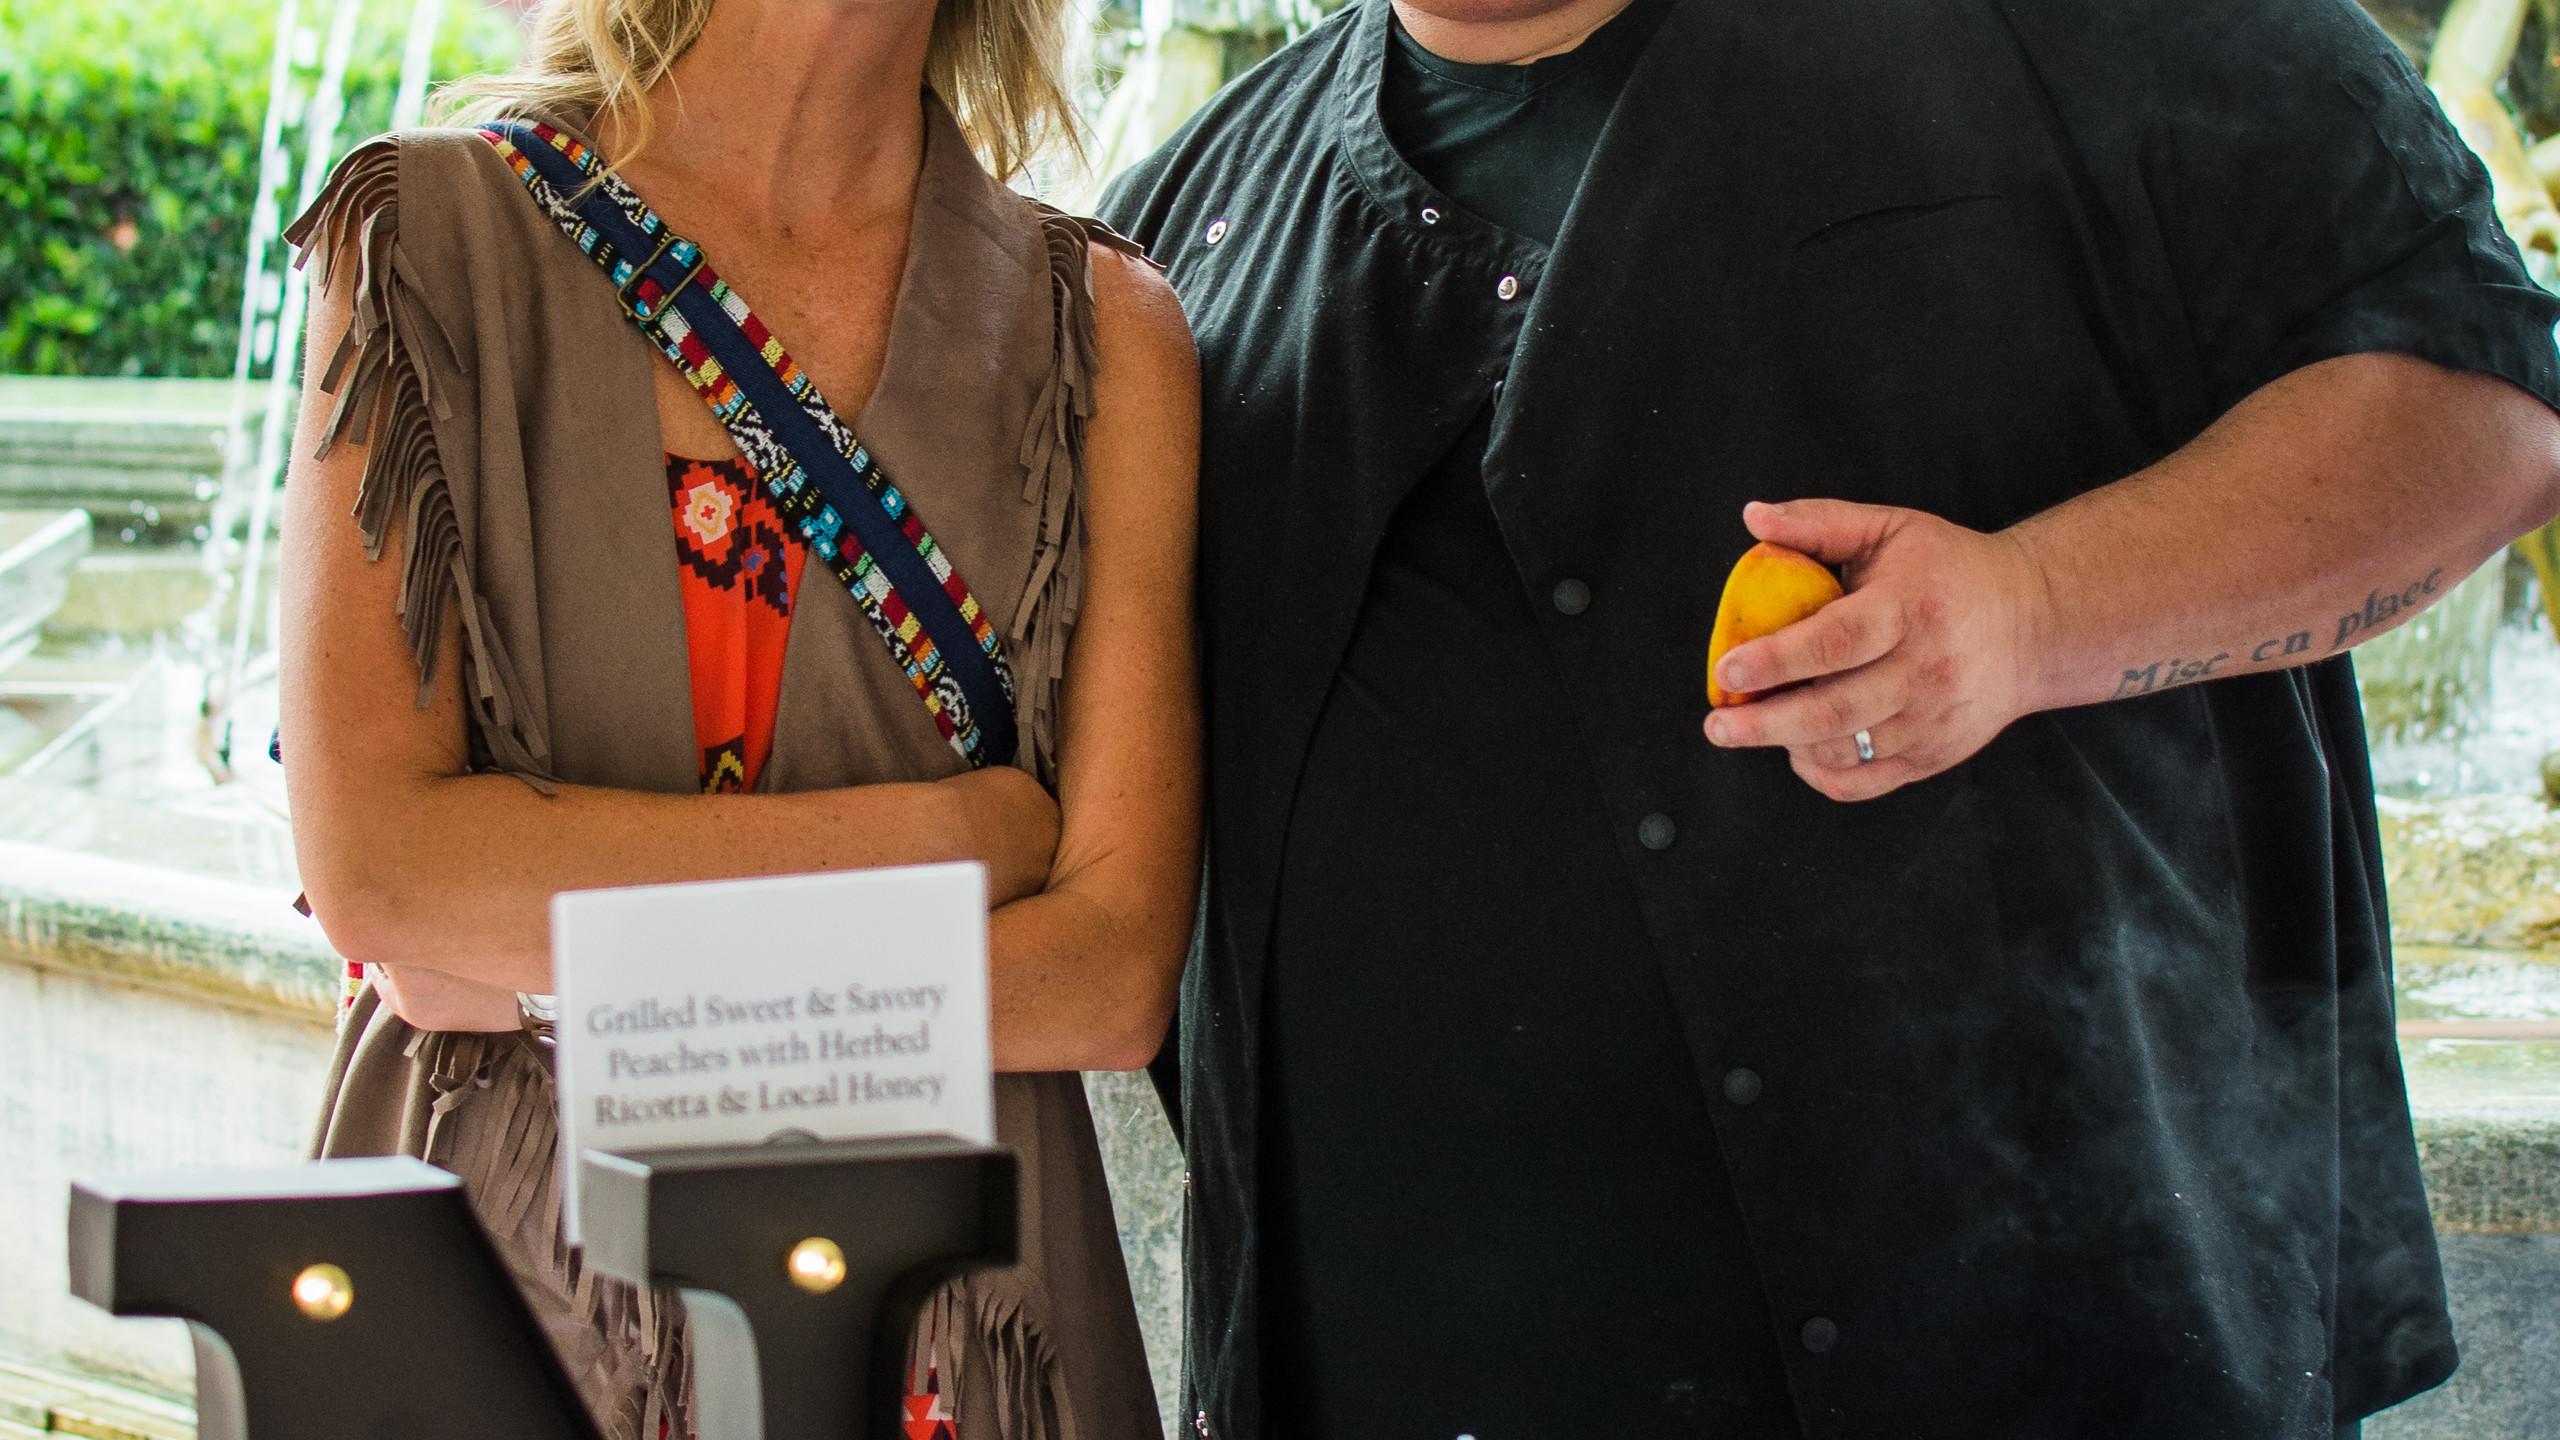 Jackie Chambers and Nicholas Nicoletta